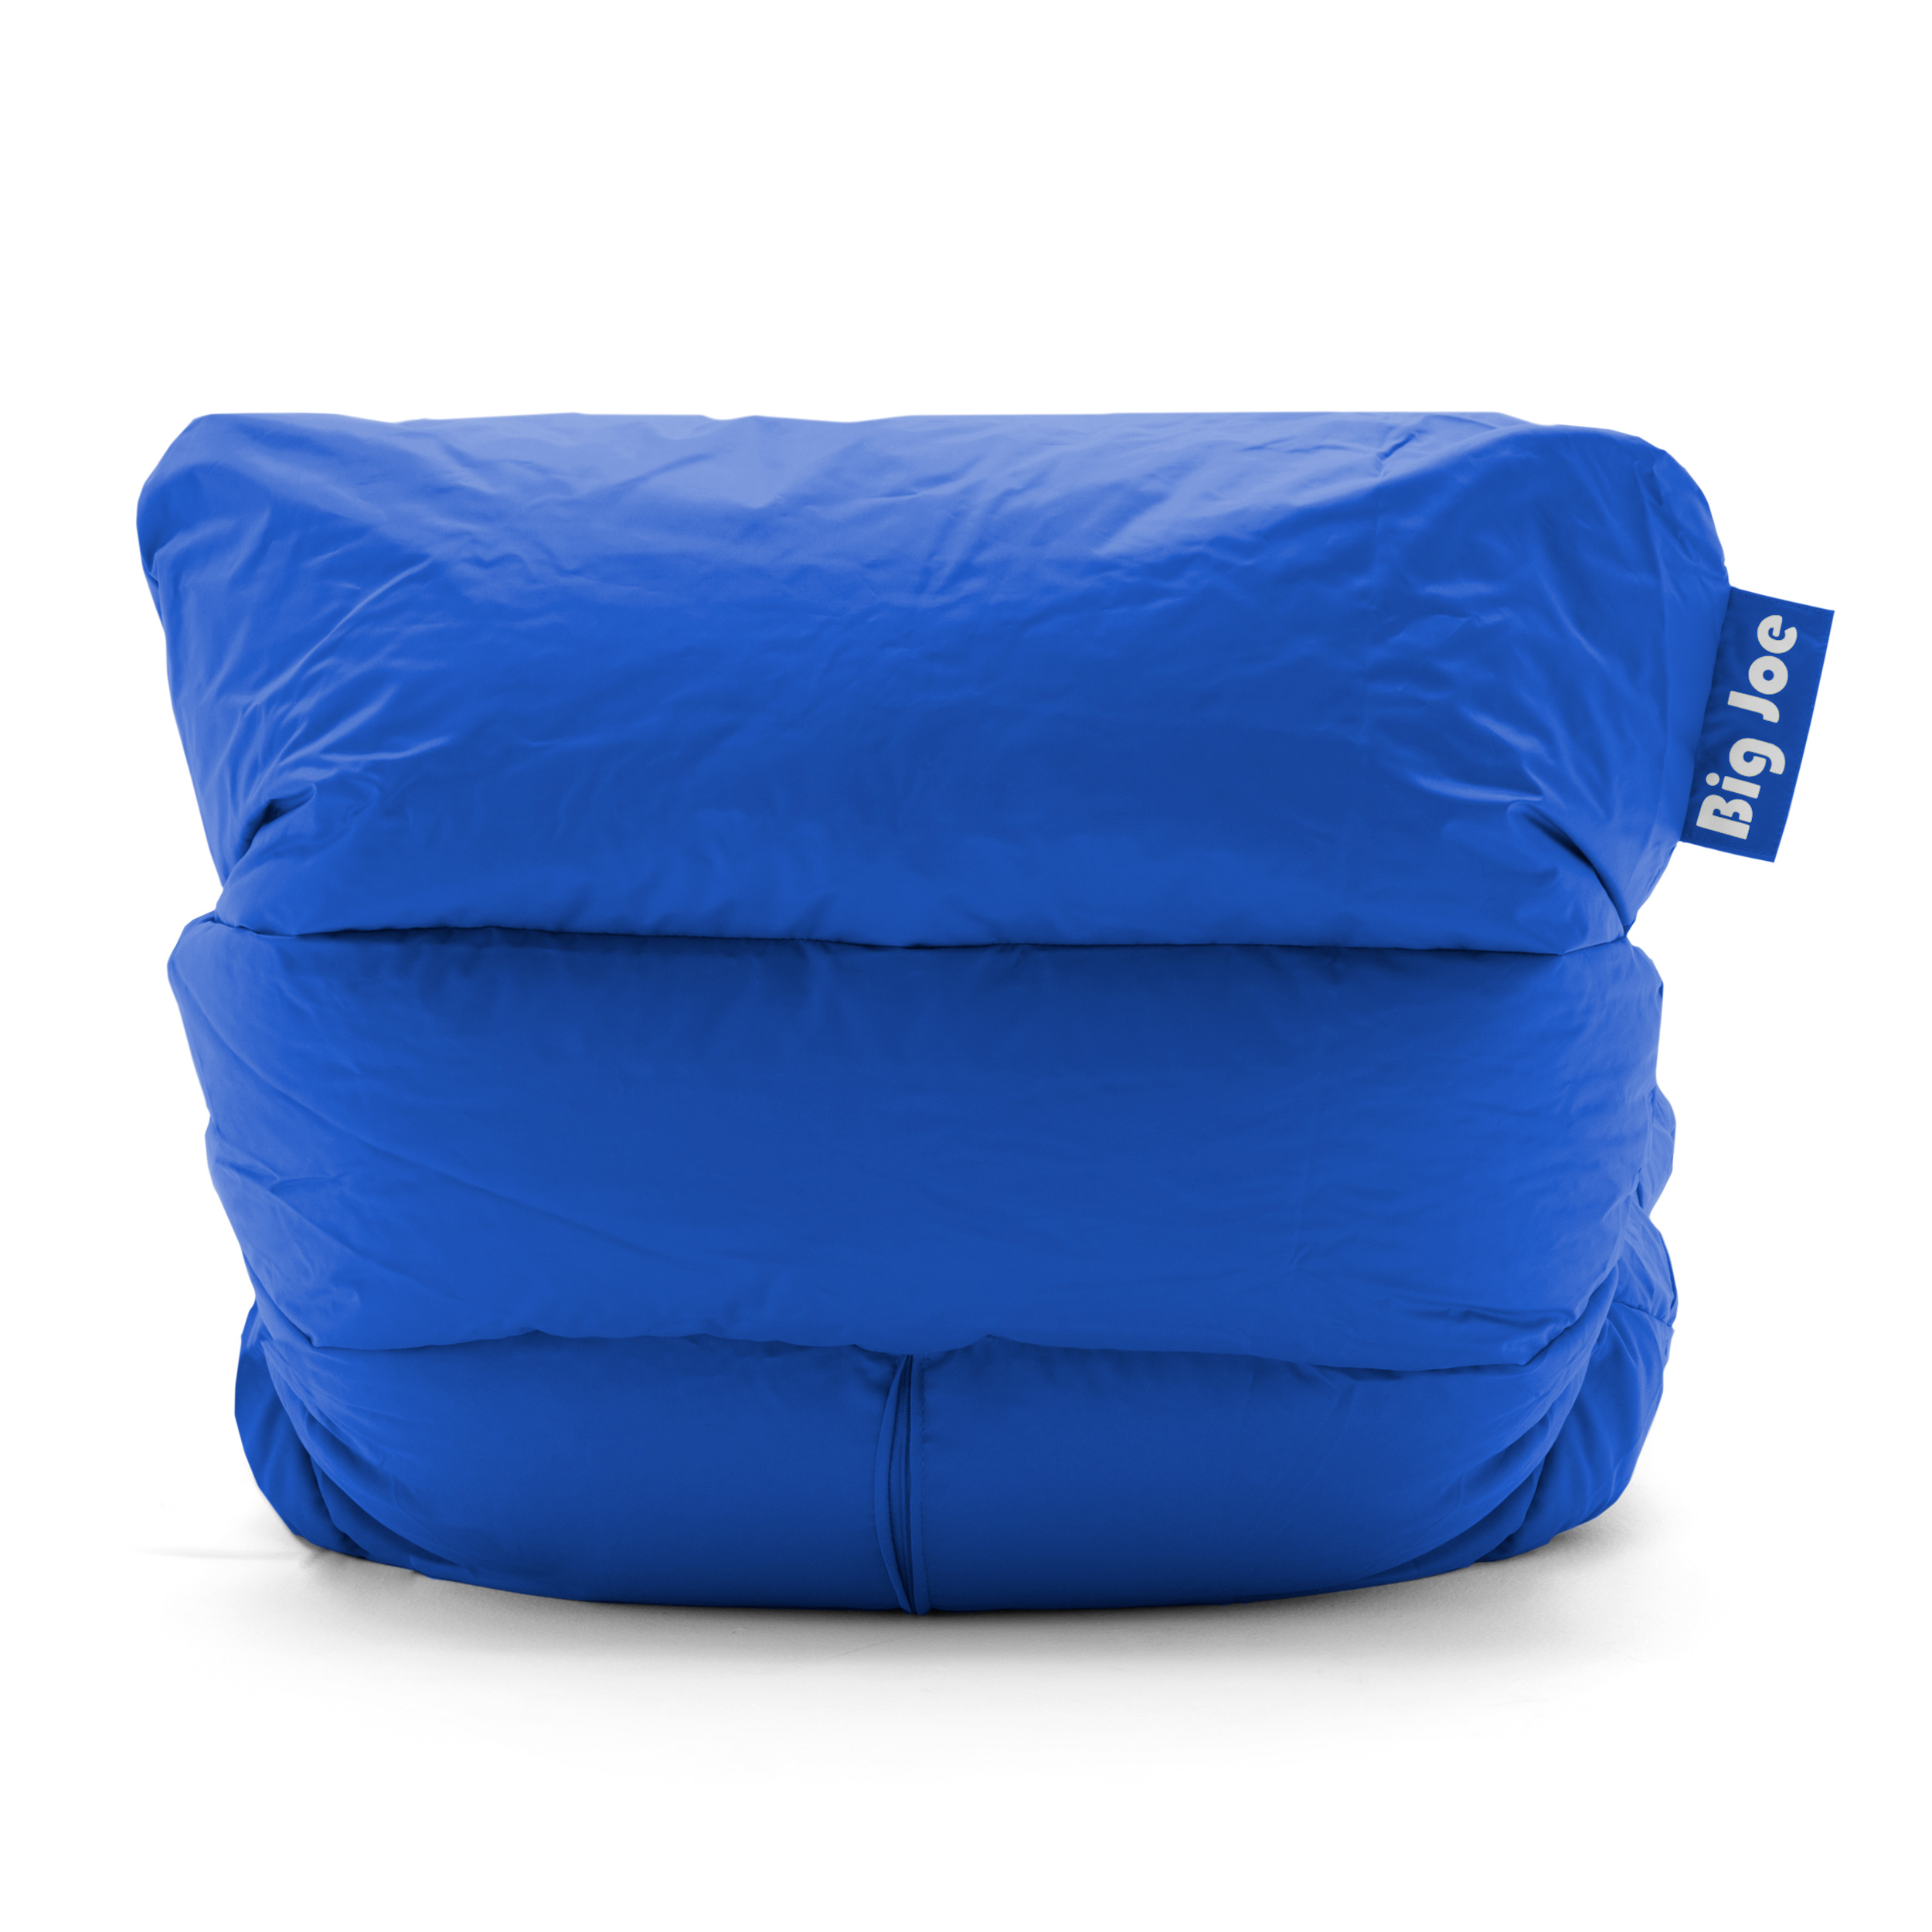 big joe roma floor chair ergonomic keyboard position bean bag sapphire color fabrics